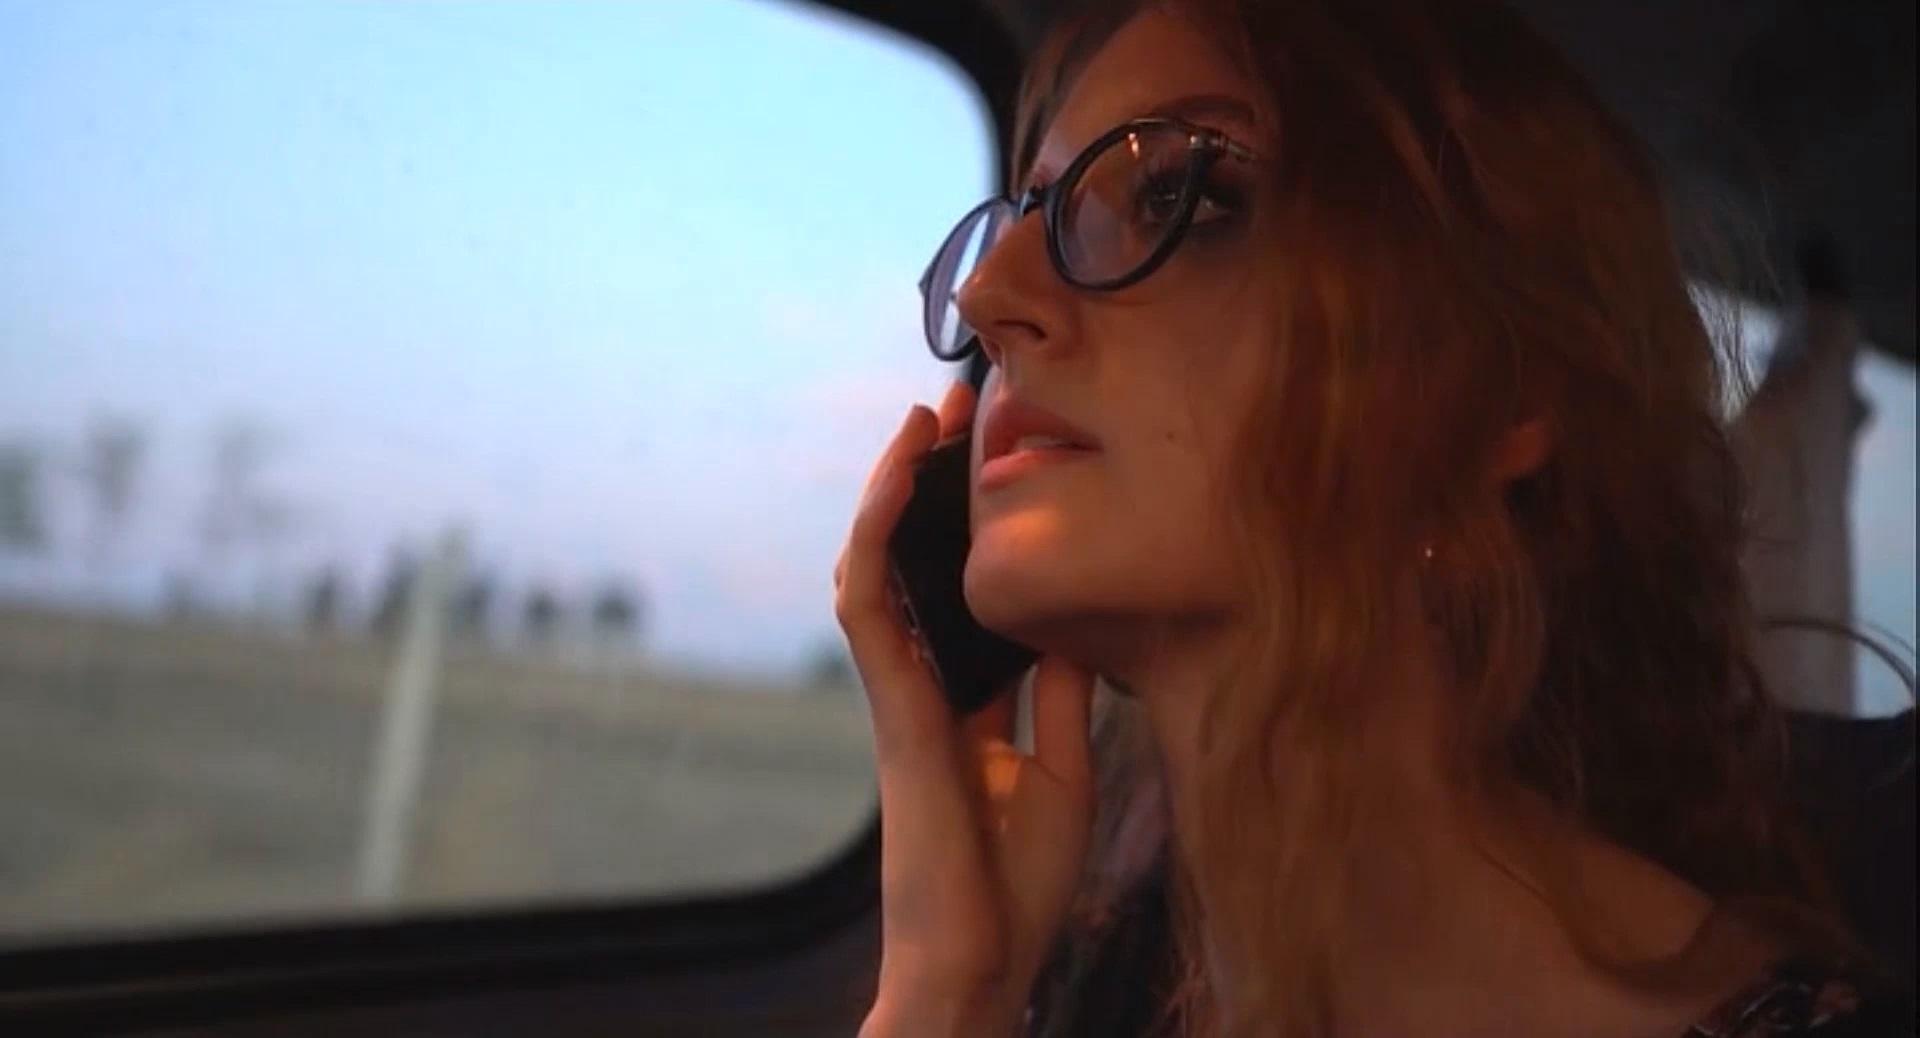 Karla | 2020 | Yerli Film | WEB-DL | XviD | Sansürsüz | 1080p - m720p - m1080p | WEB-DL | Tek Link